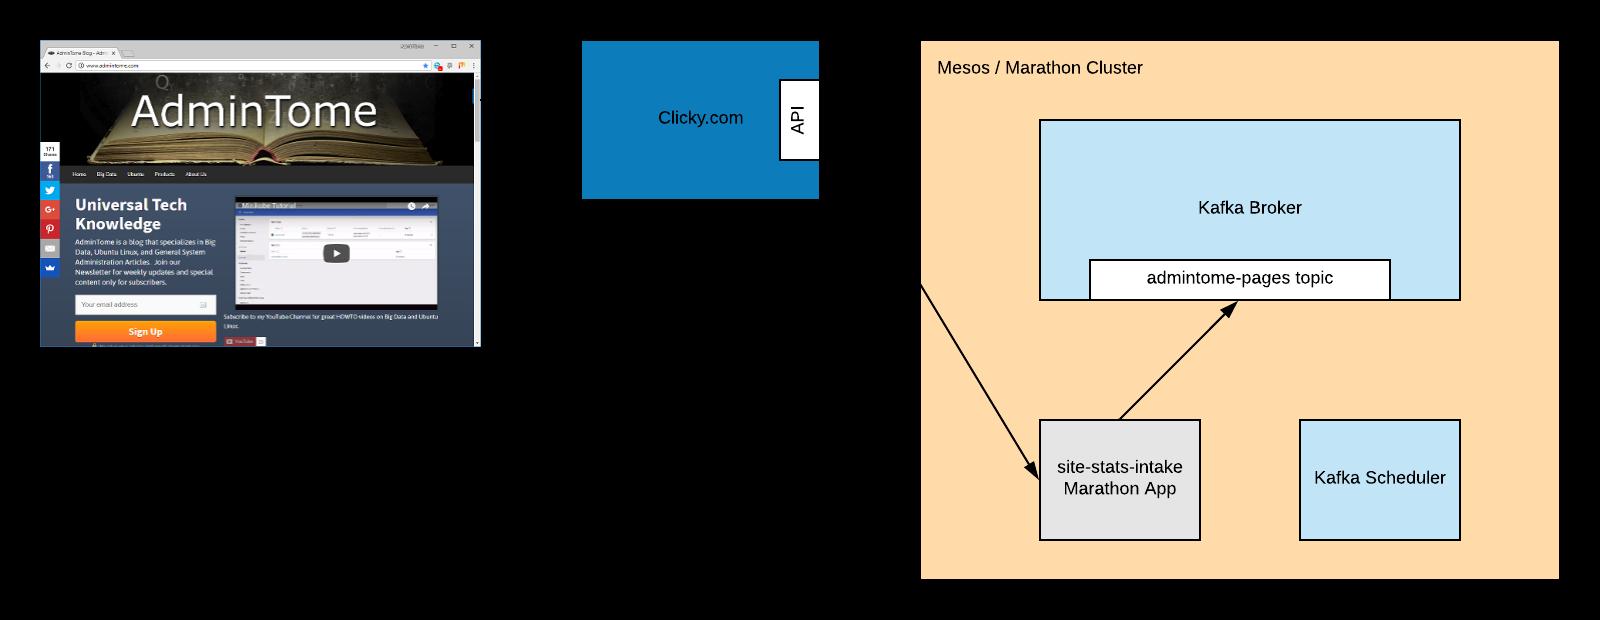 Kafka Python Tutorial for Fast Data Architecture - DZone Big Data